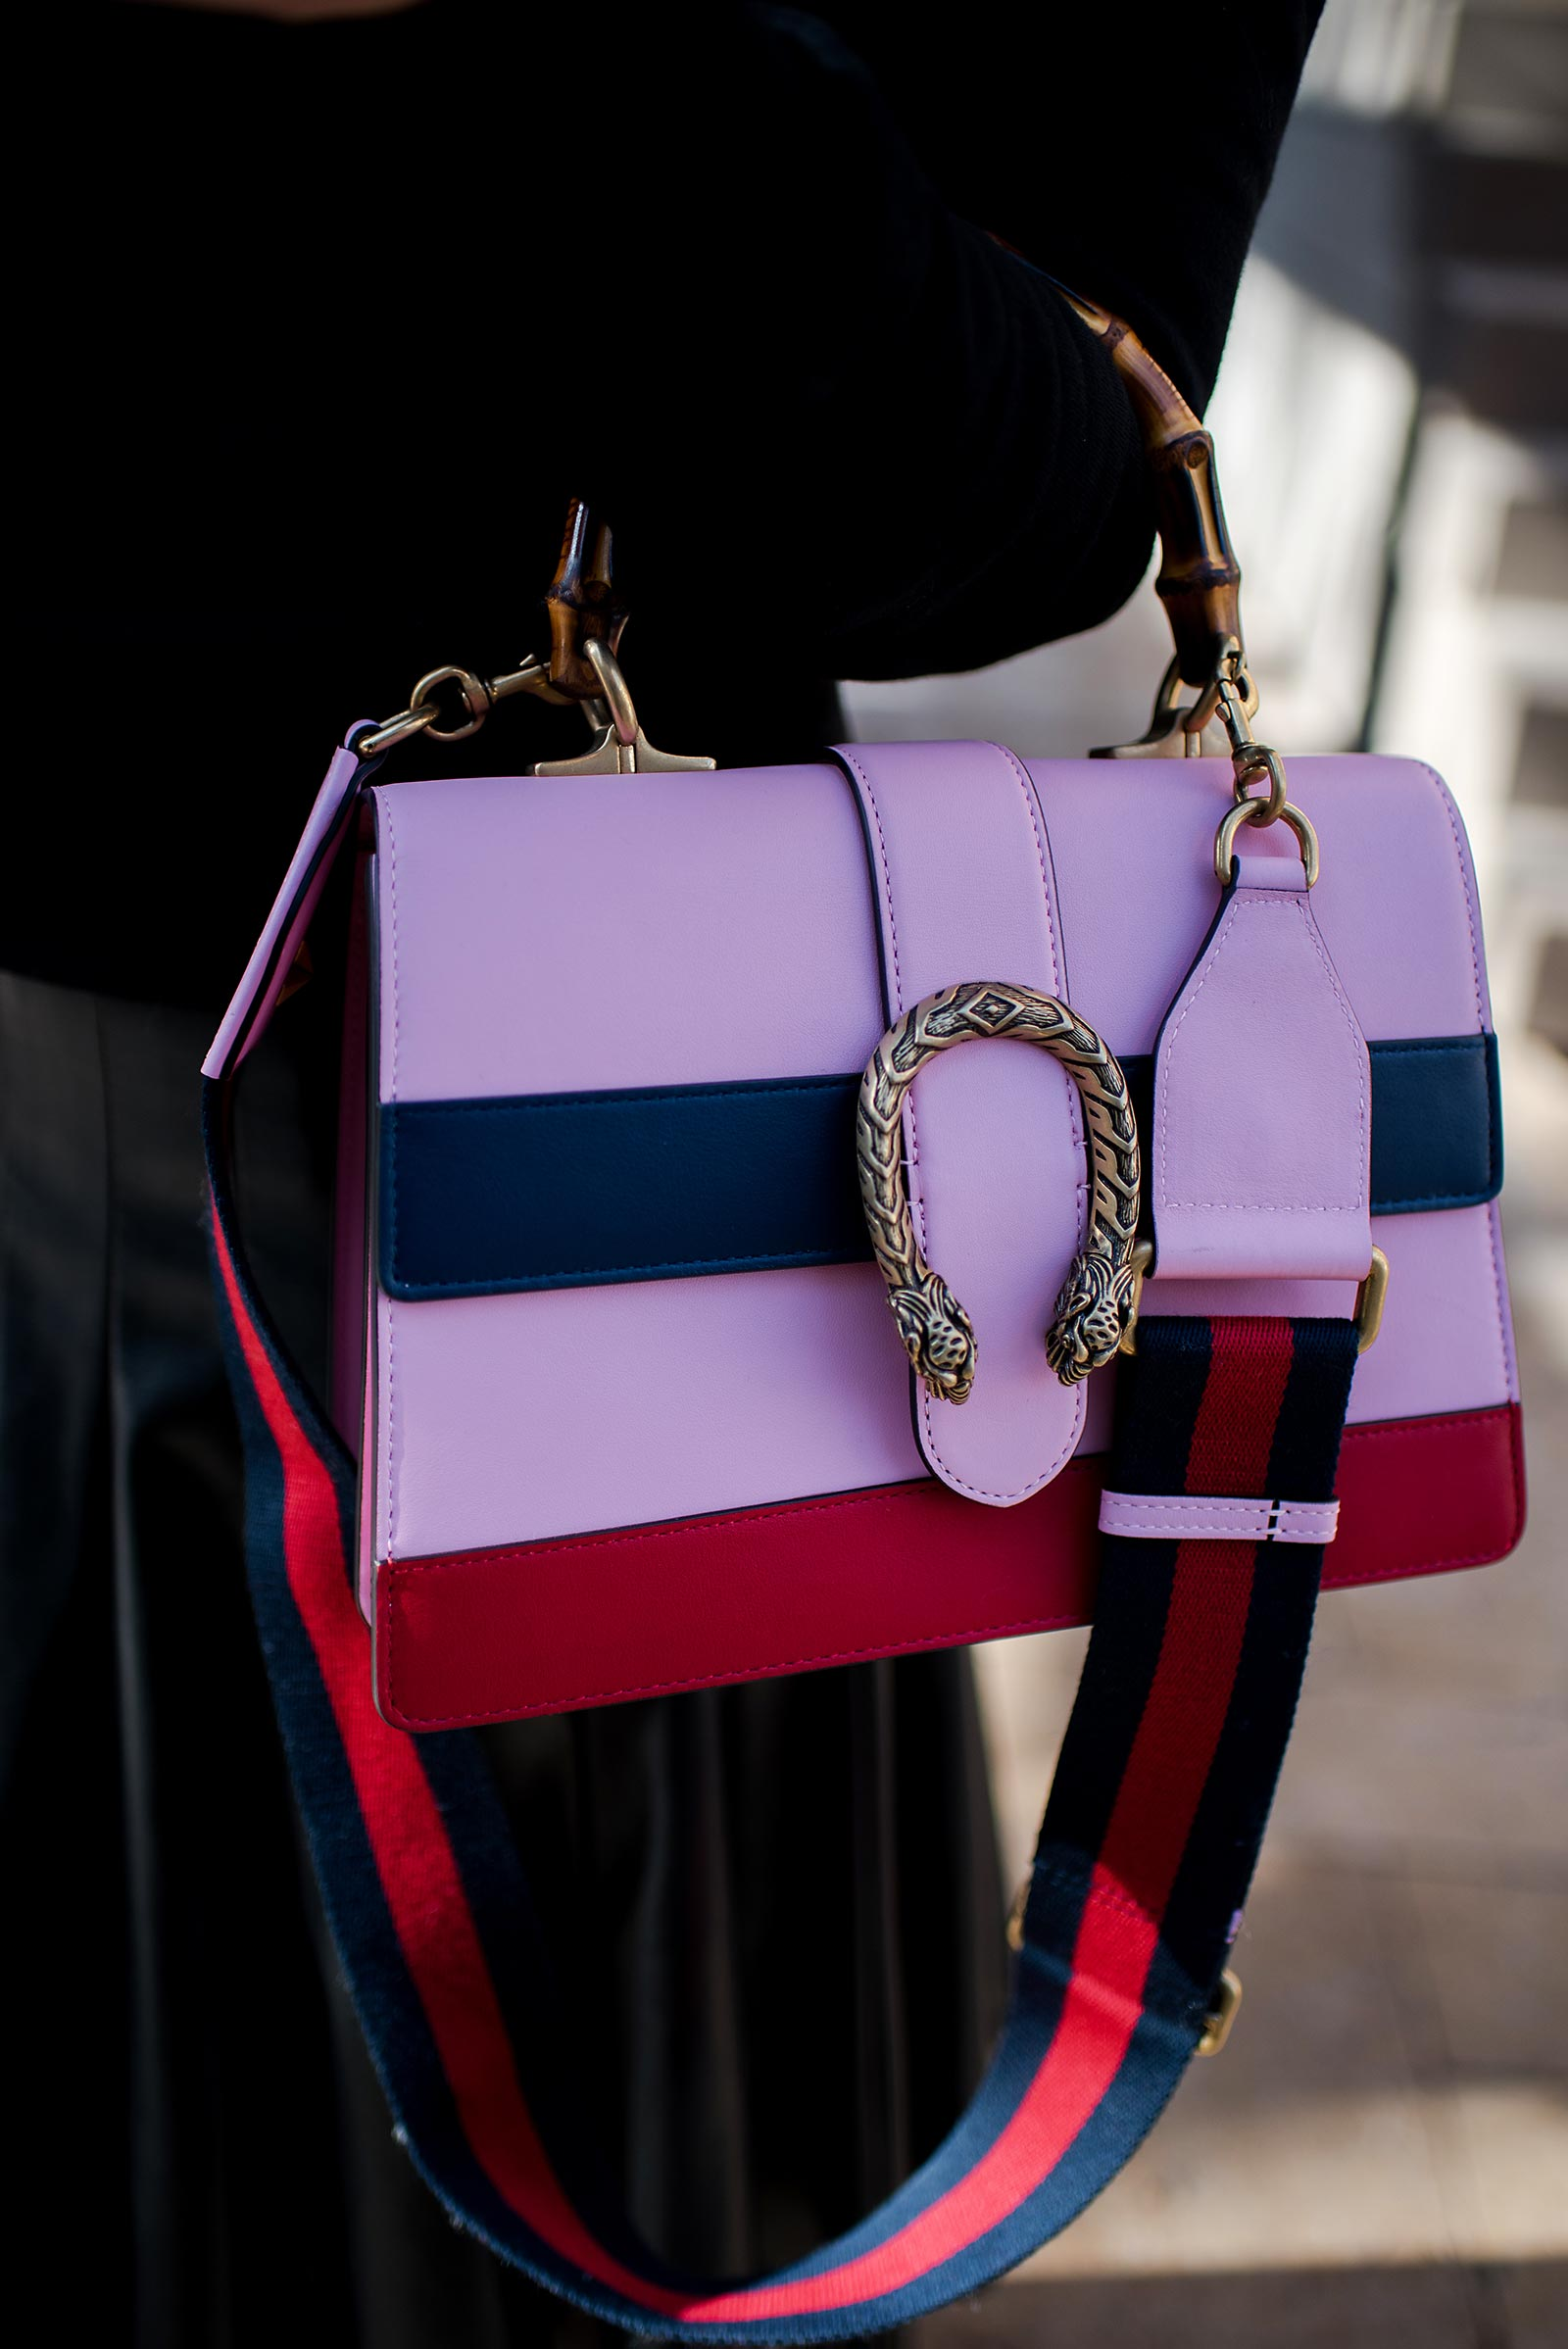 Anna Roufos Sosa of Noir Friday wearing the Olympia Le-Tan smoking lips beaded sweatshirt and a Gucci bag.